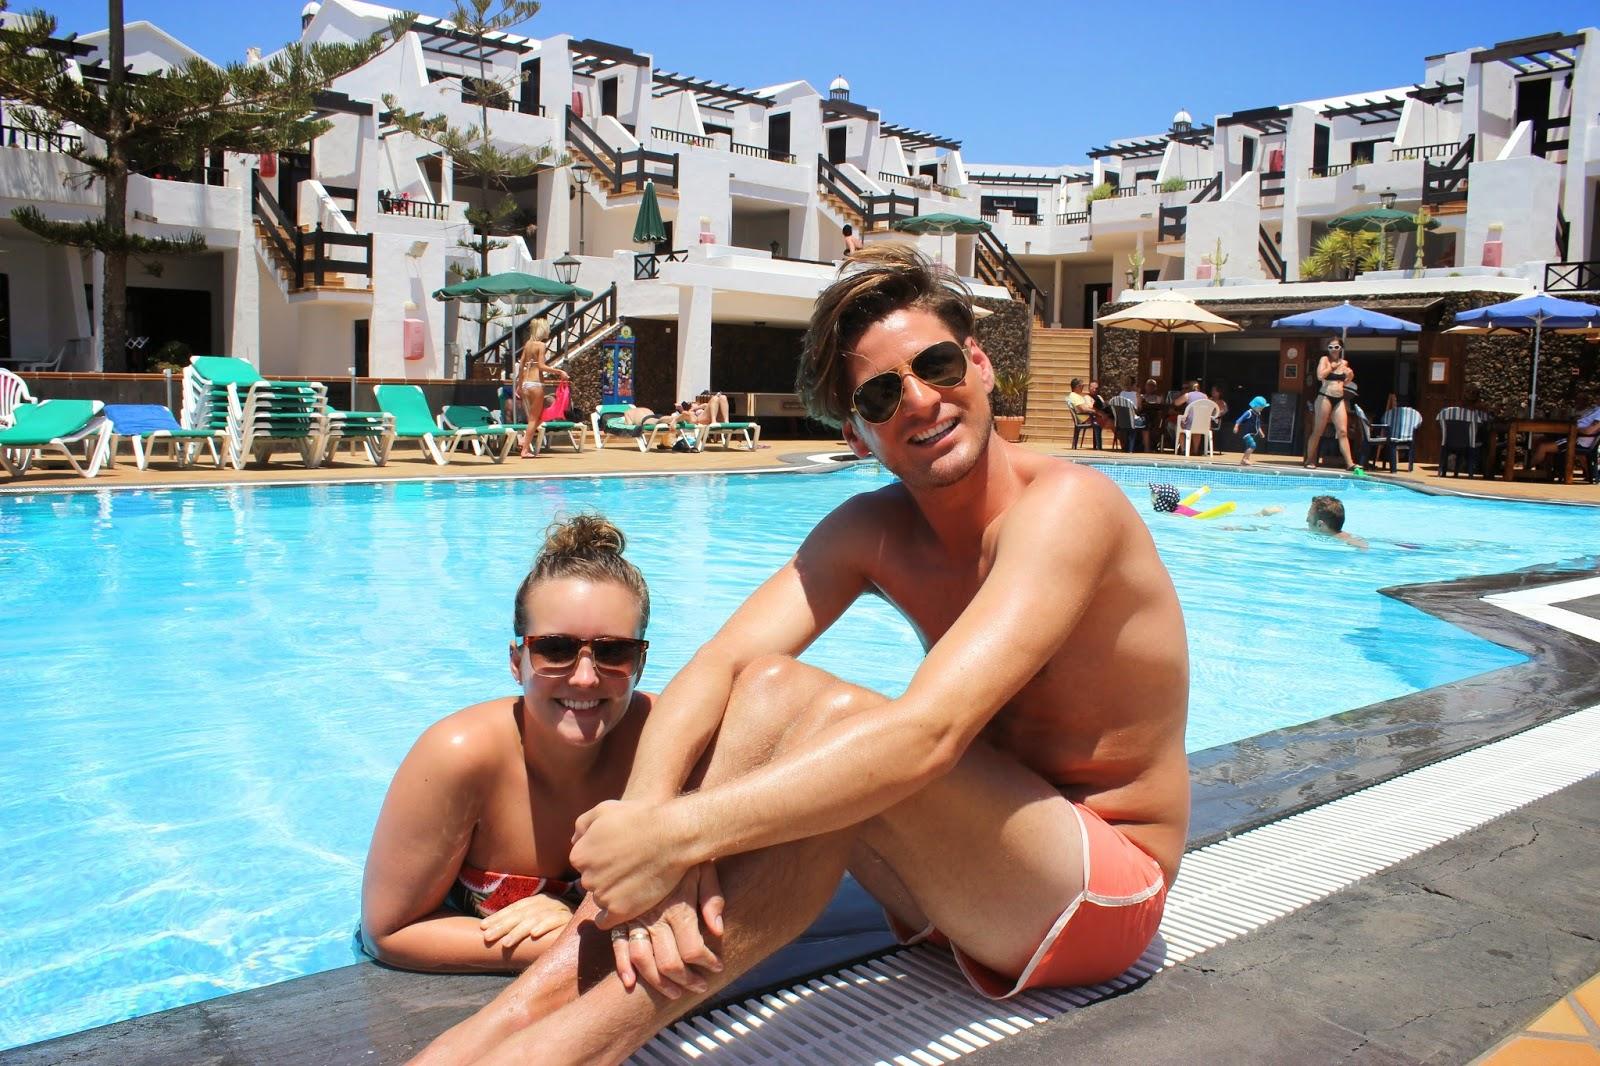 lifestyle, lanzarote, that guy luke, blog, sunshine, summer, canary islands, ironman lanzarote, summer holiday, canaries, triathlon, sport, photography, blog, blogger, lifestyle blog